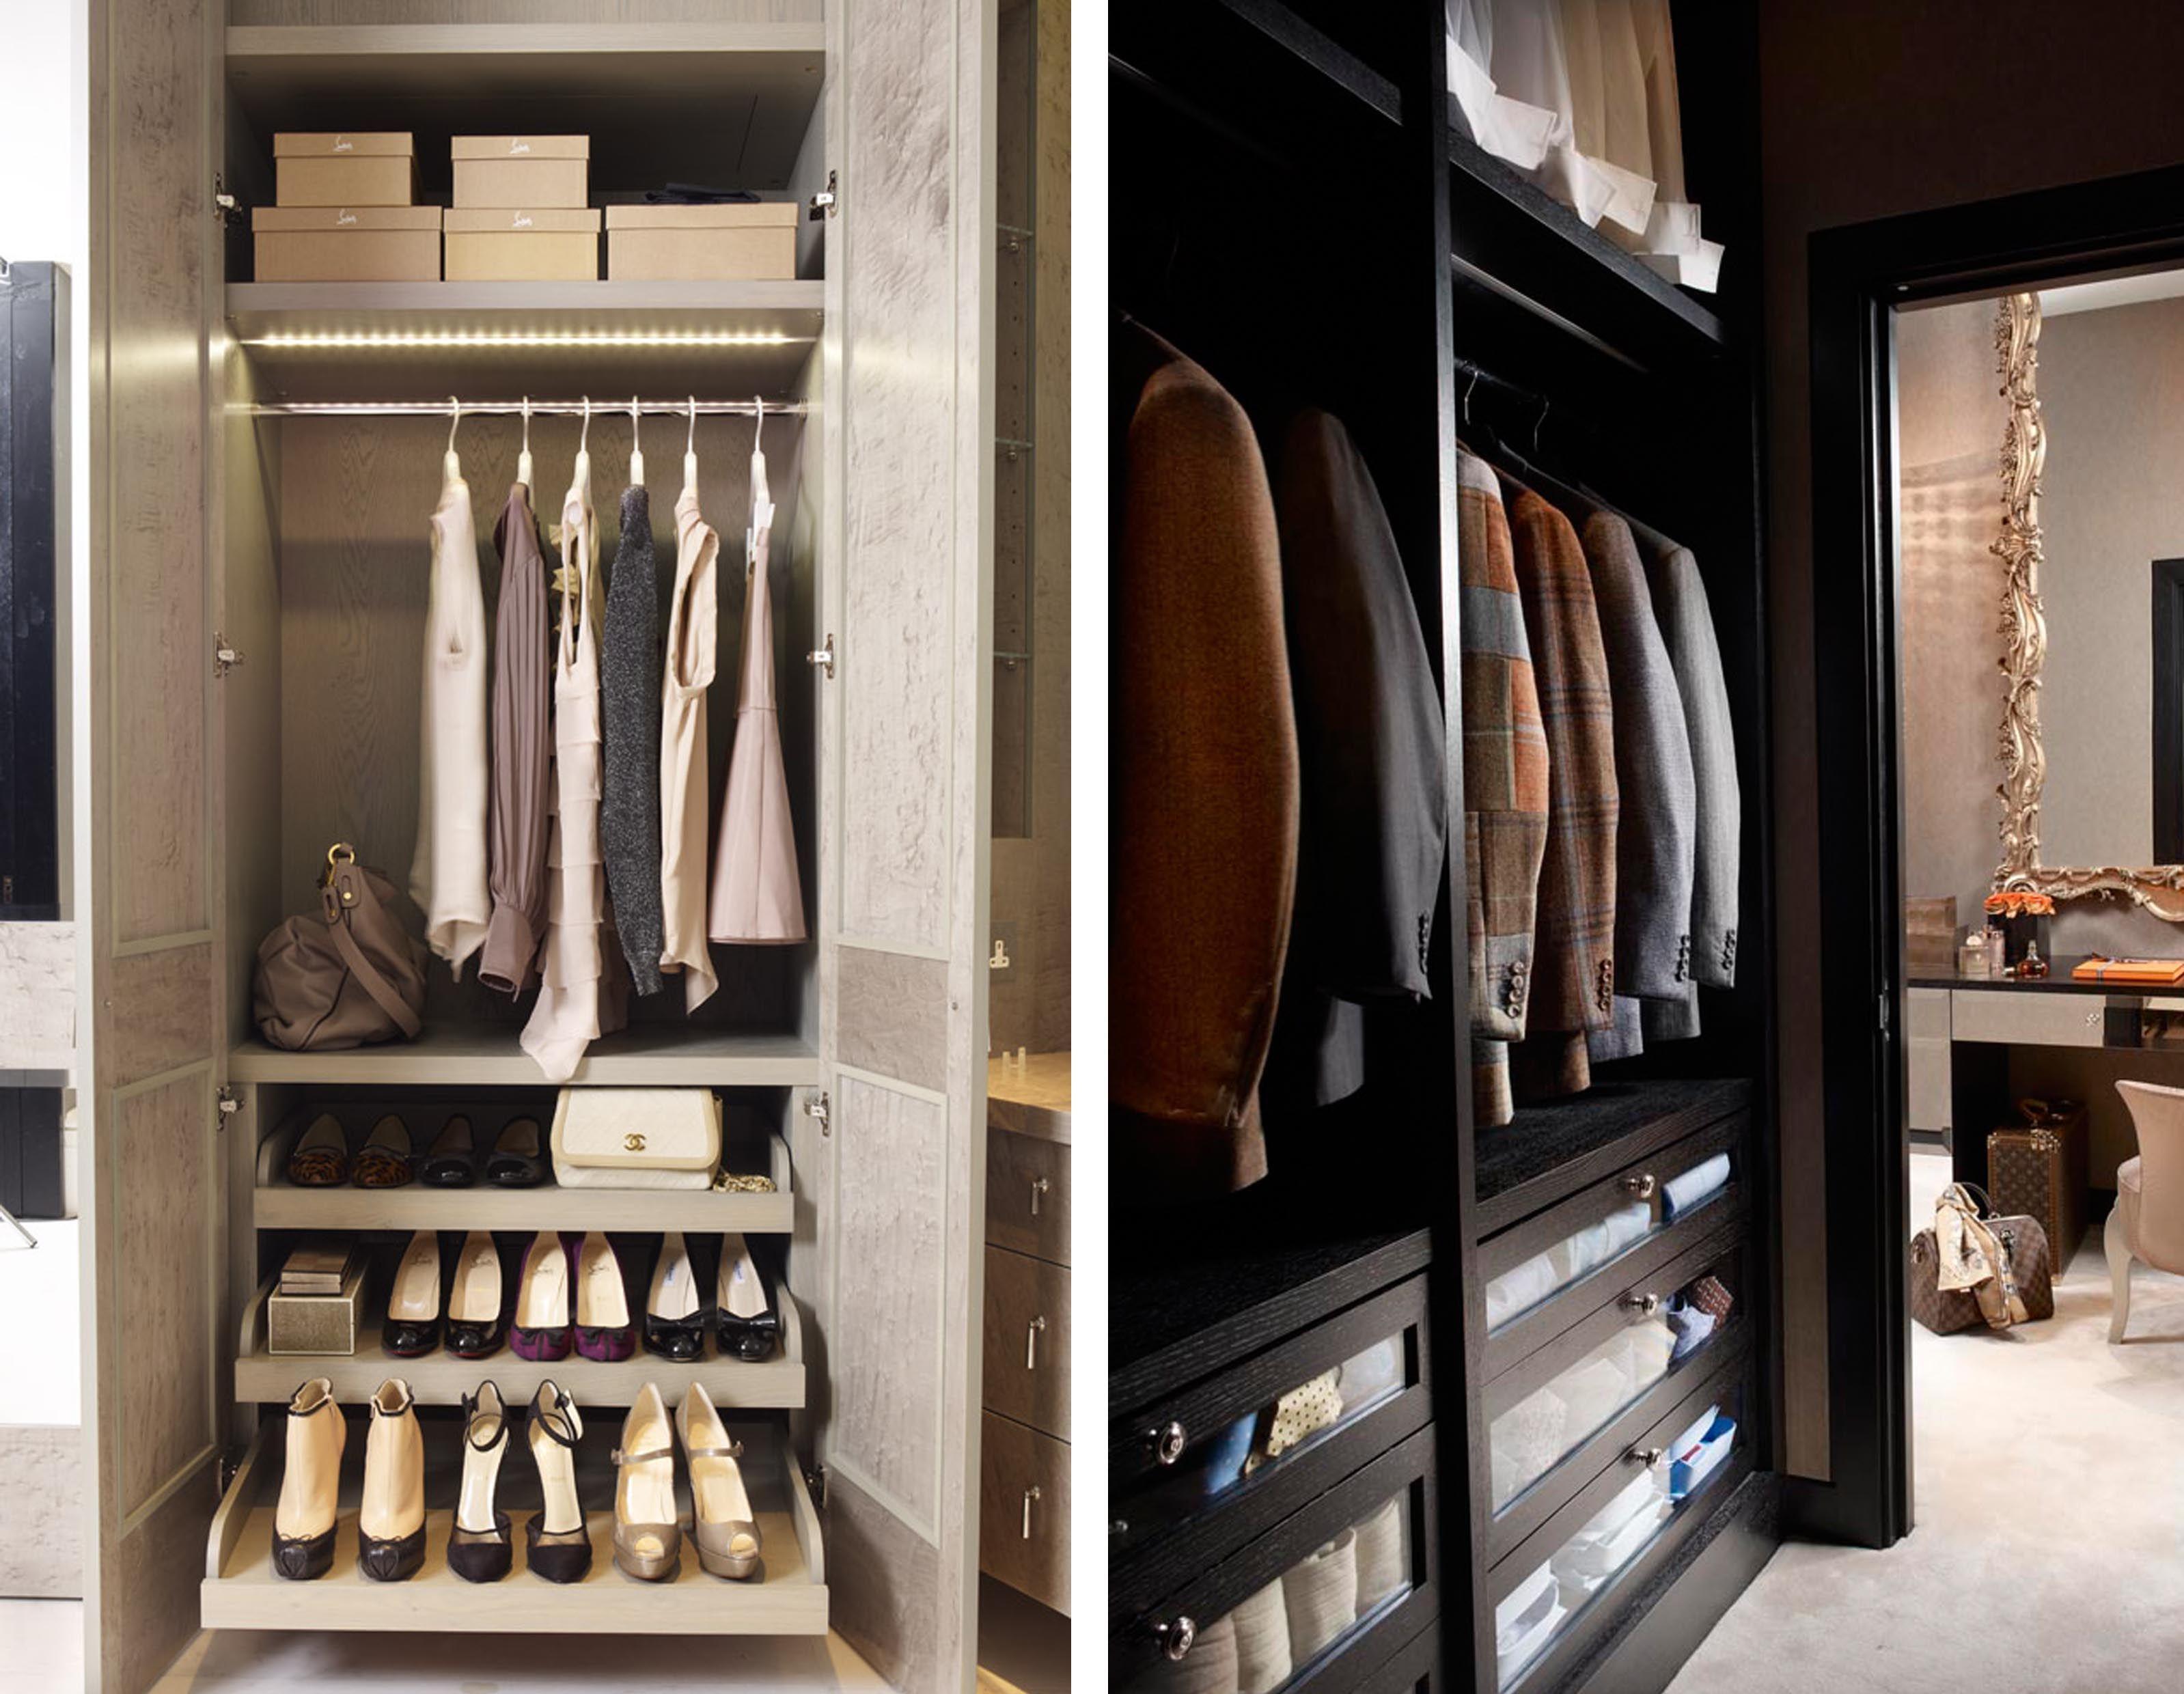 Loft bedroom with walk in wardrobe  Bespoke wardrobe design by Richwood London for Oliver Burns  Cole